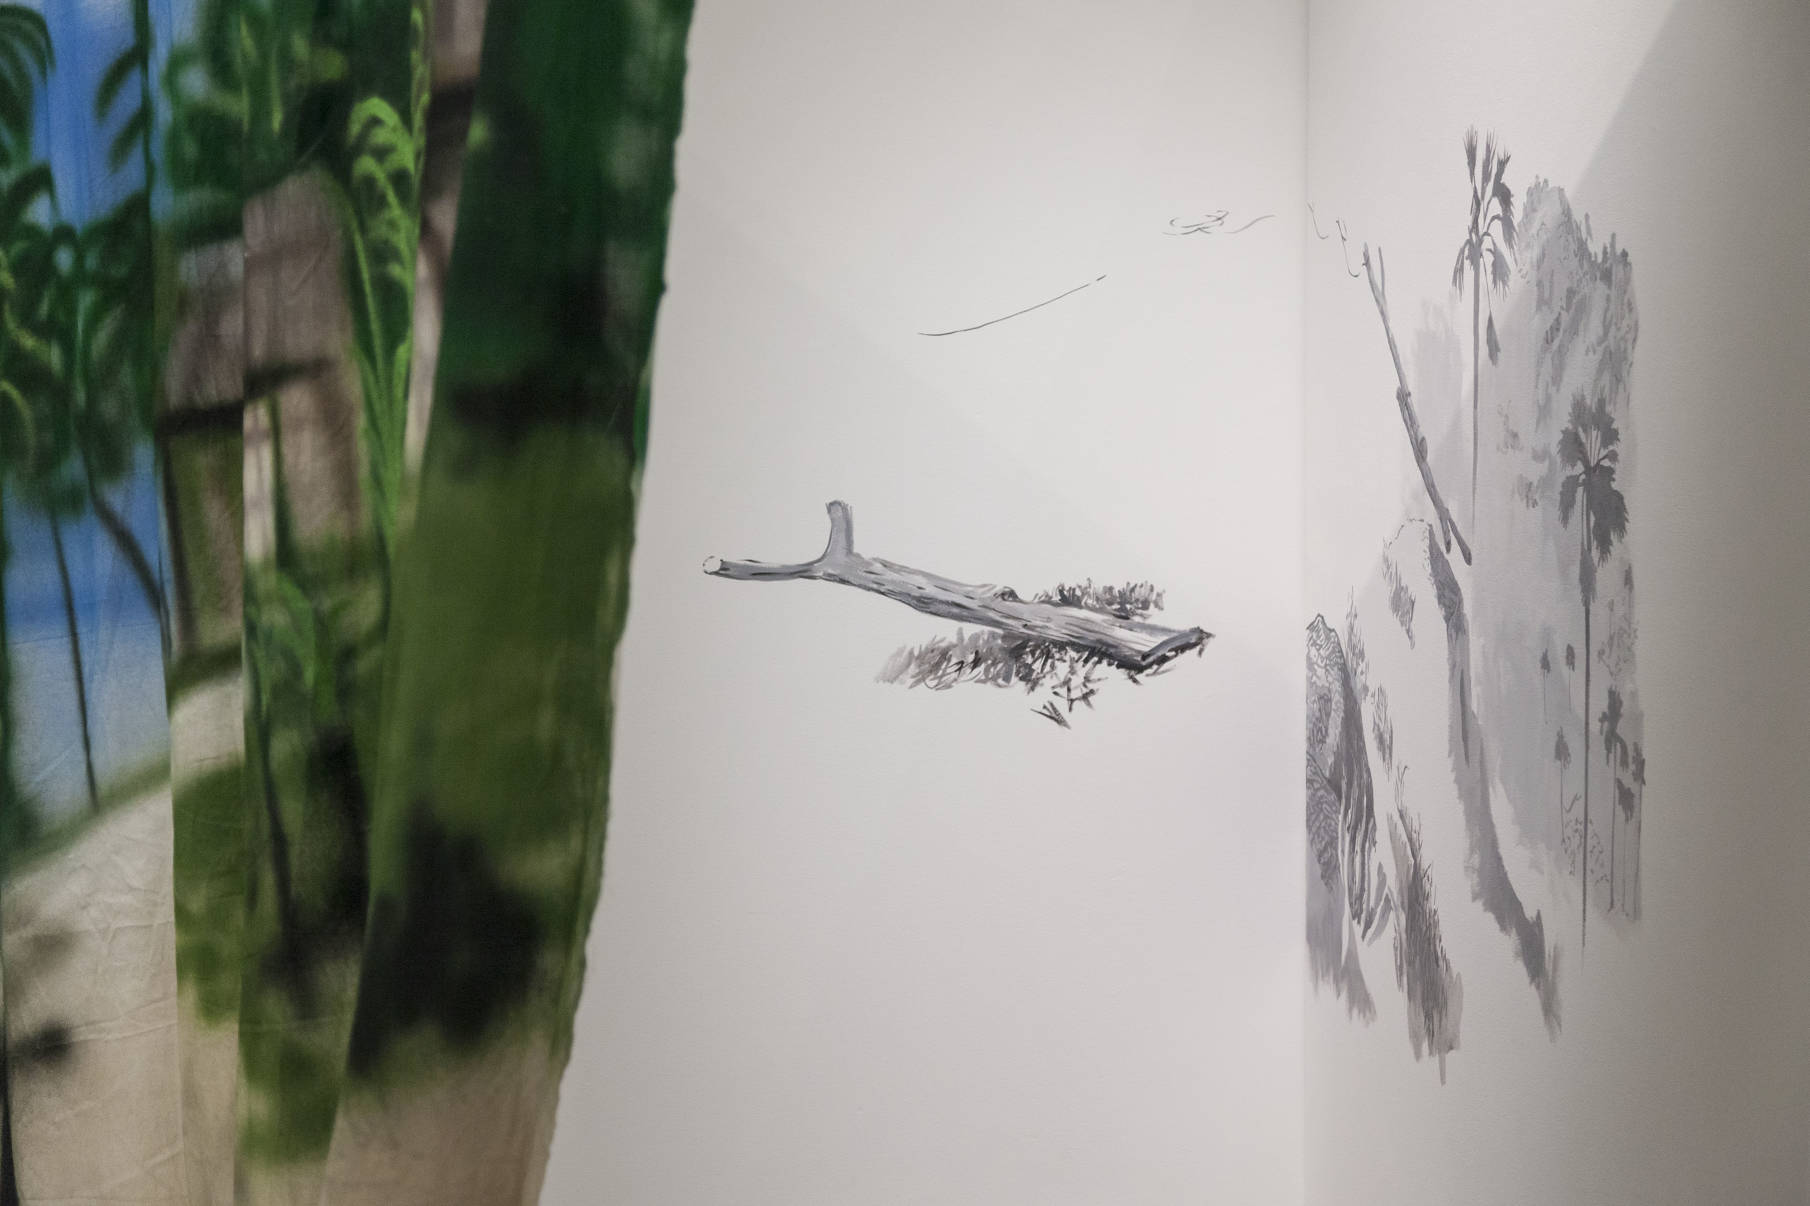 Promis(ed) Land #2 (Detail 1)